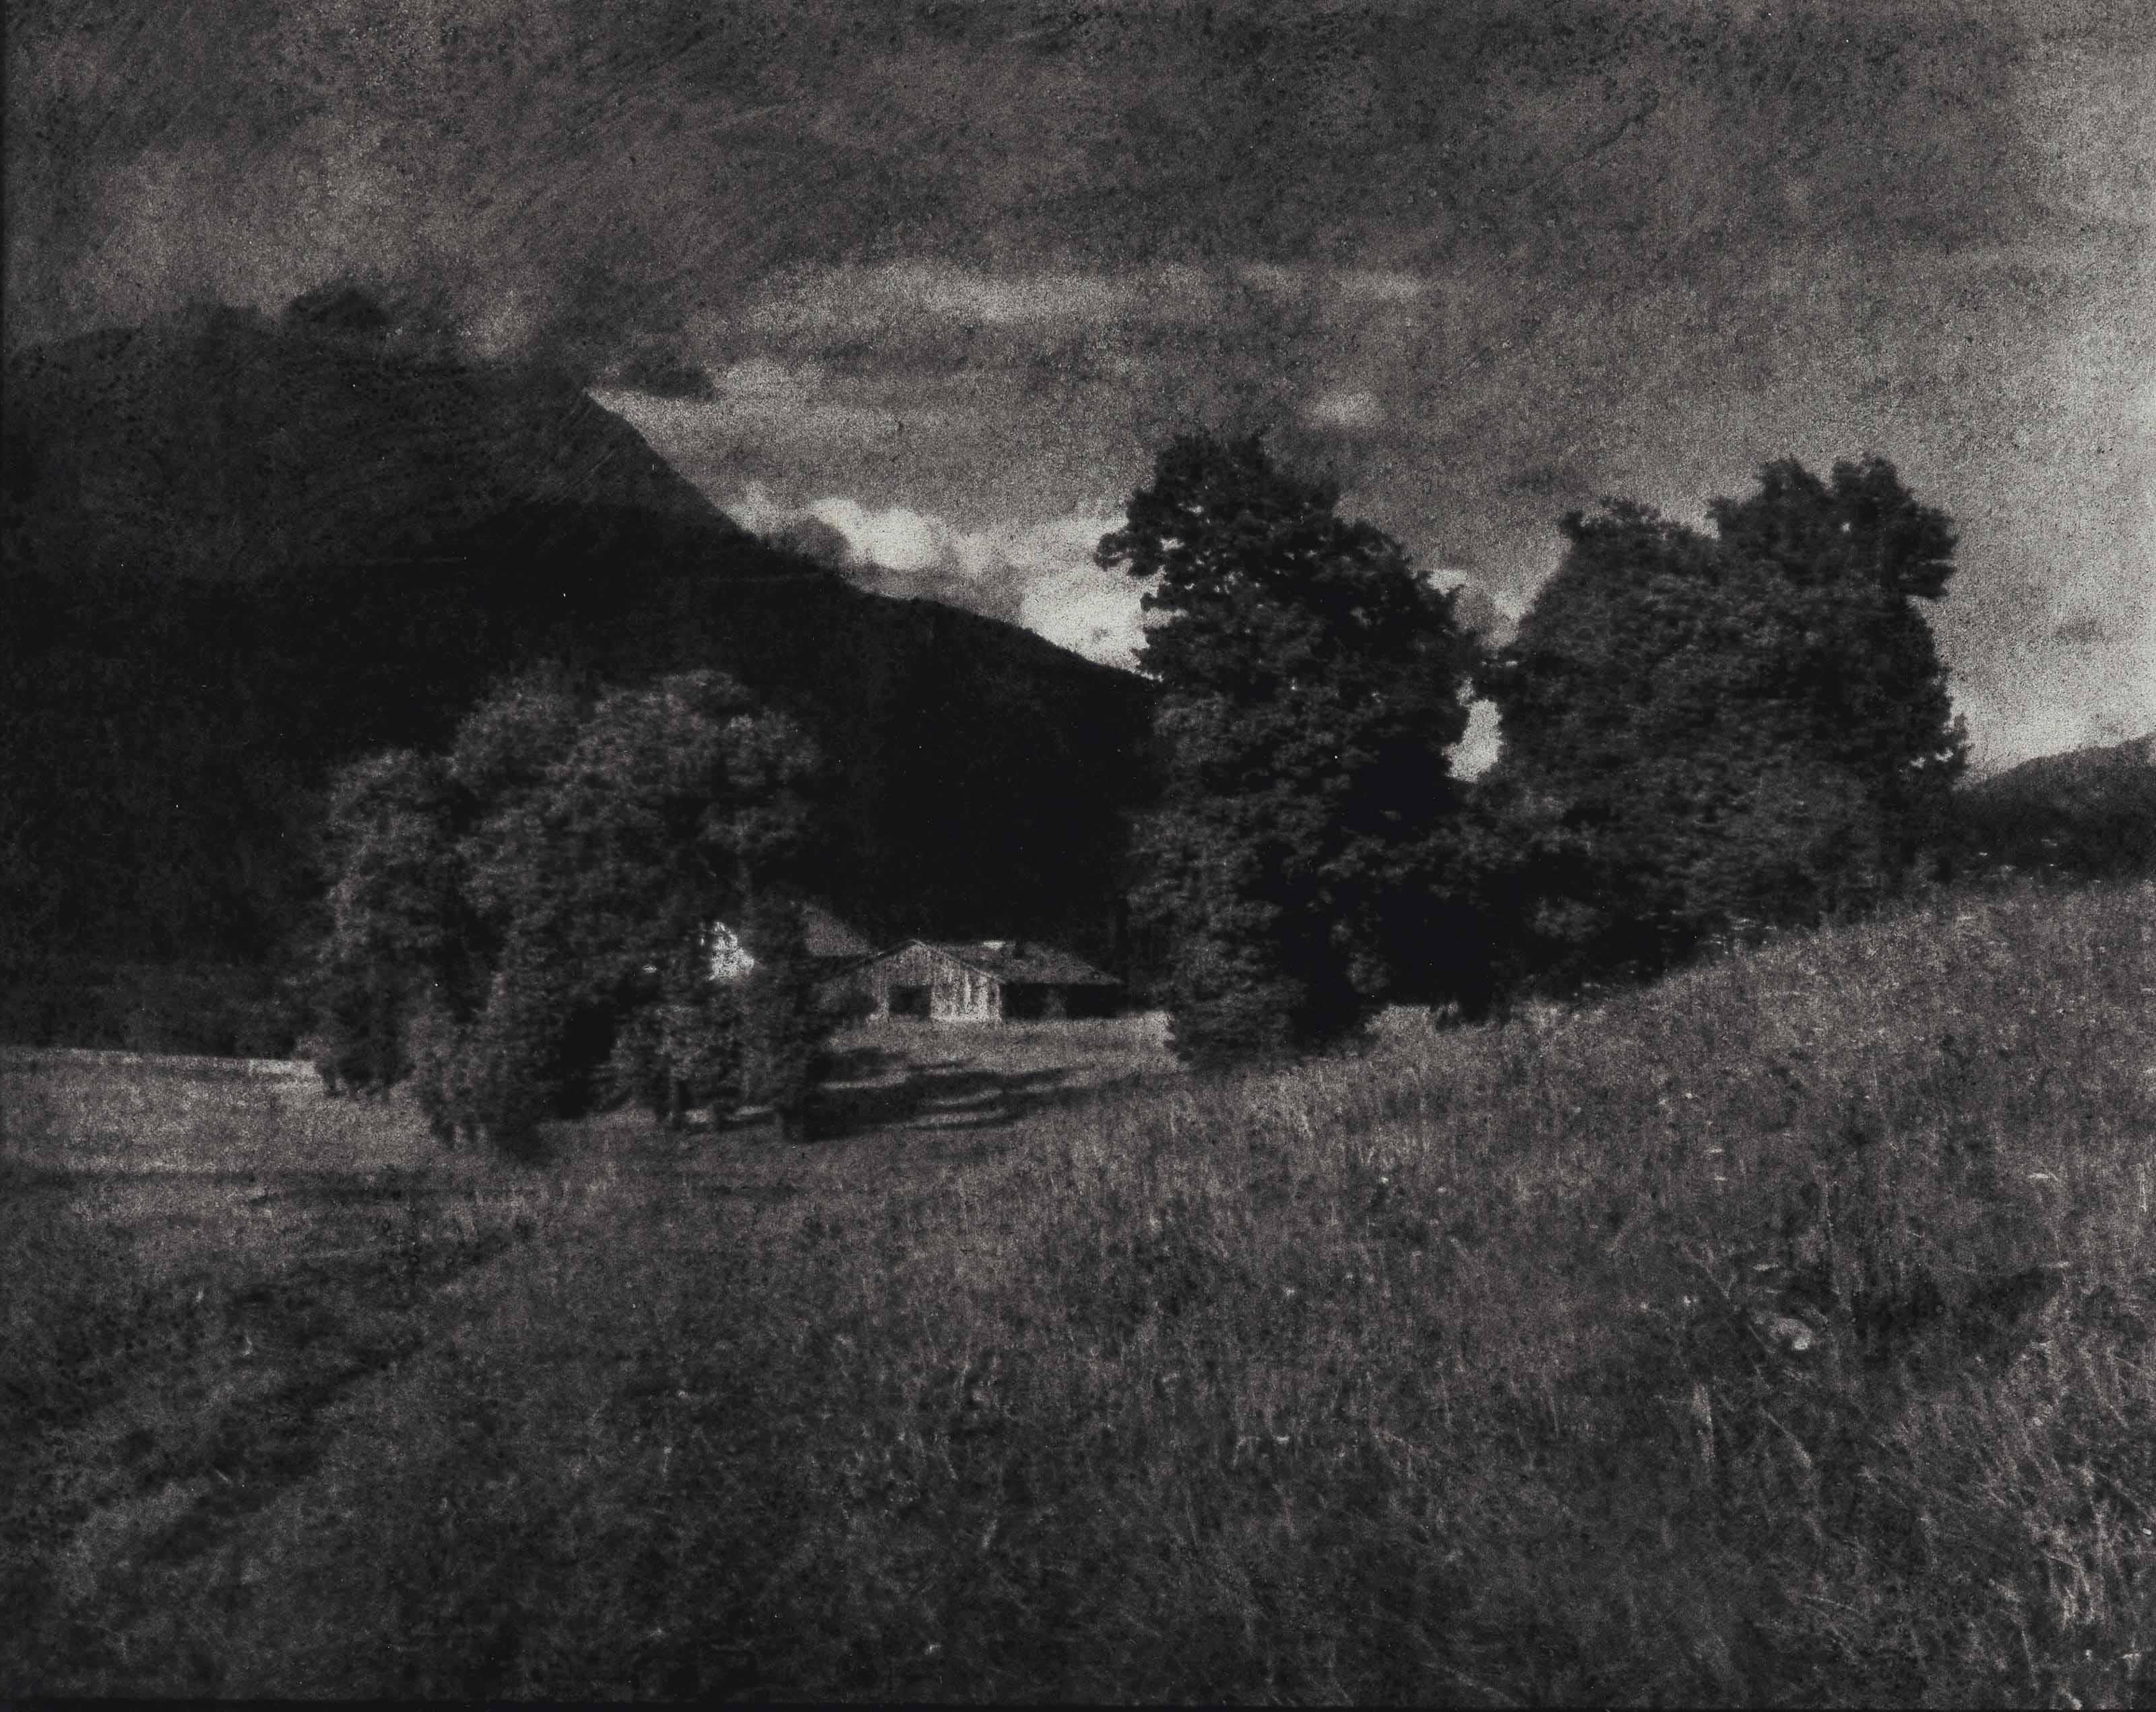 Vor Dem Sturn (Before the Storm), Tyrol, 1890s